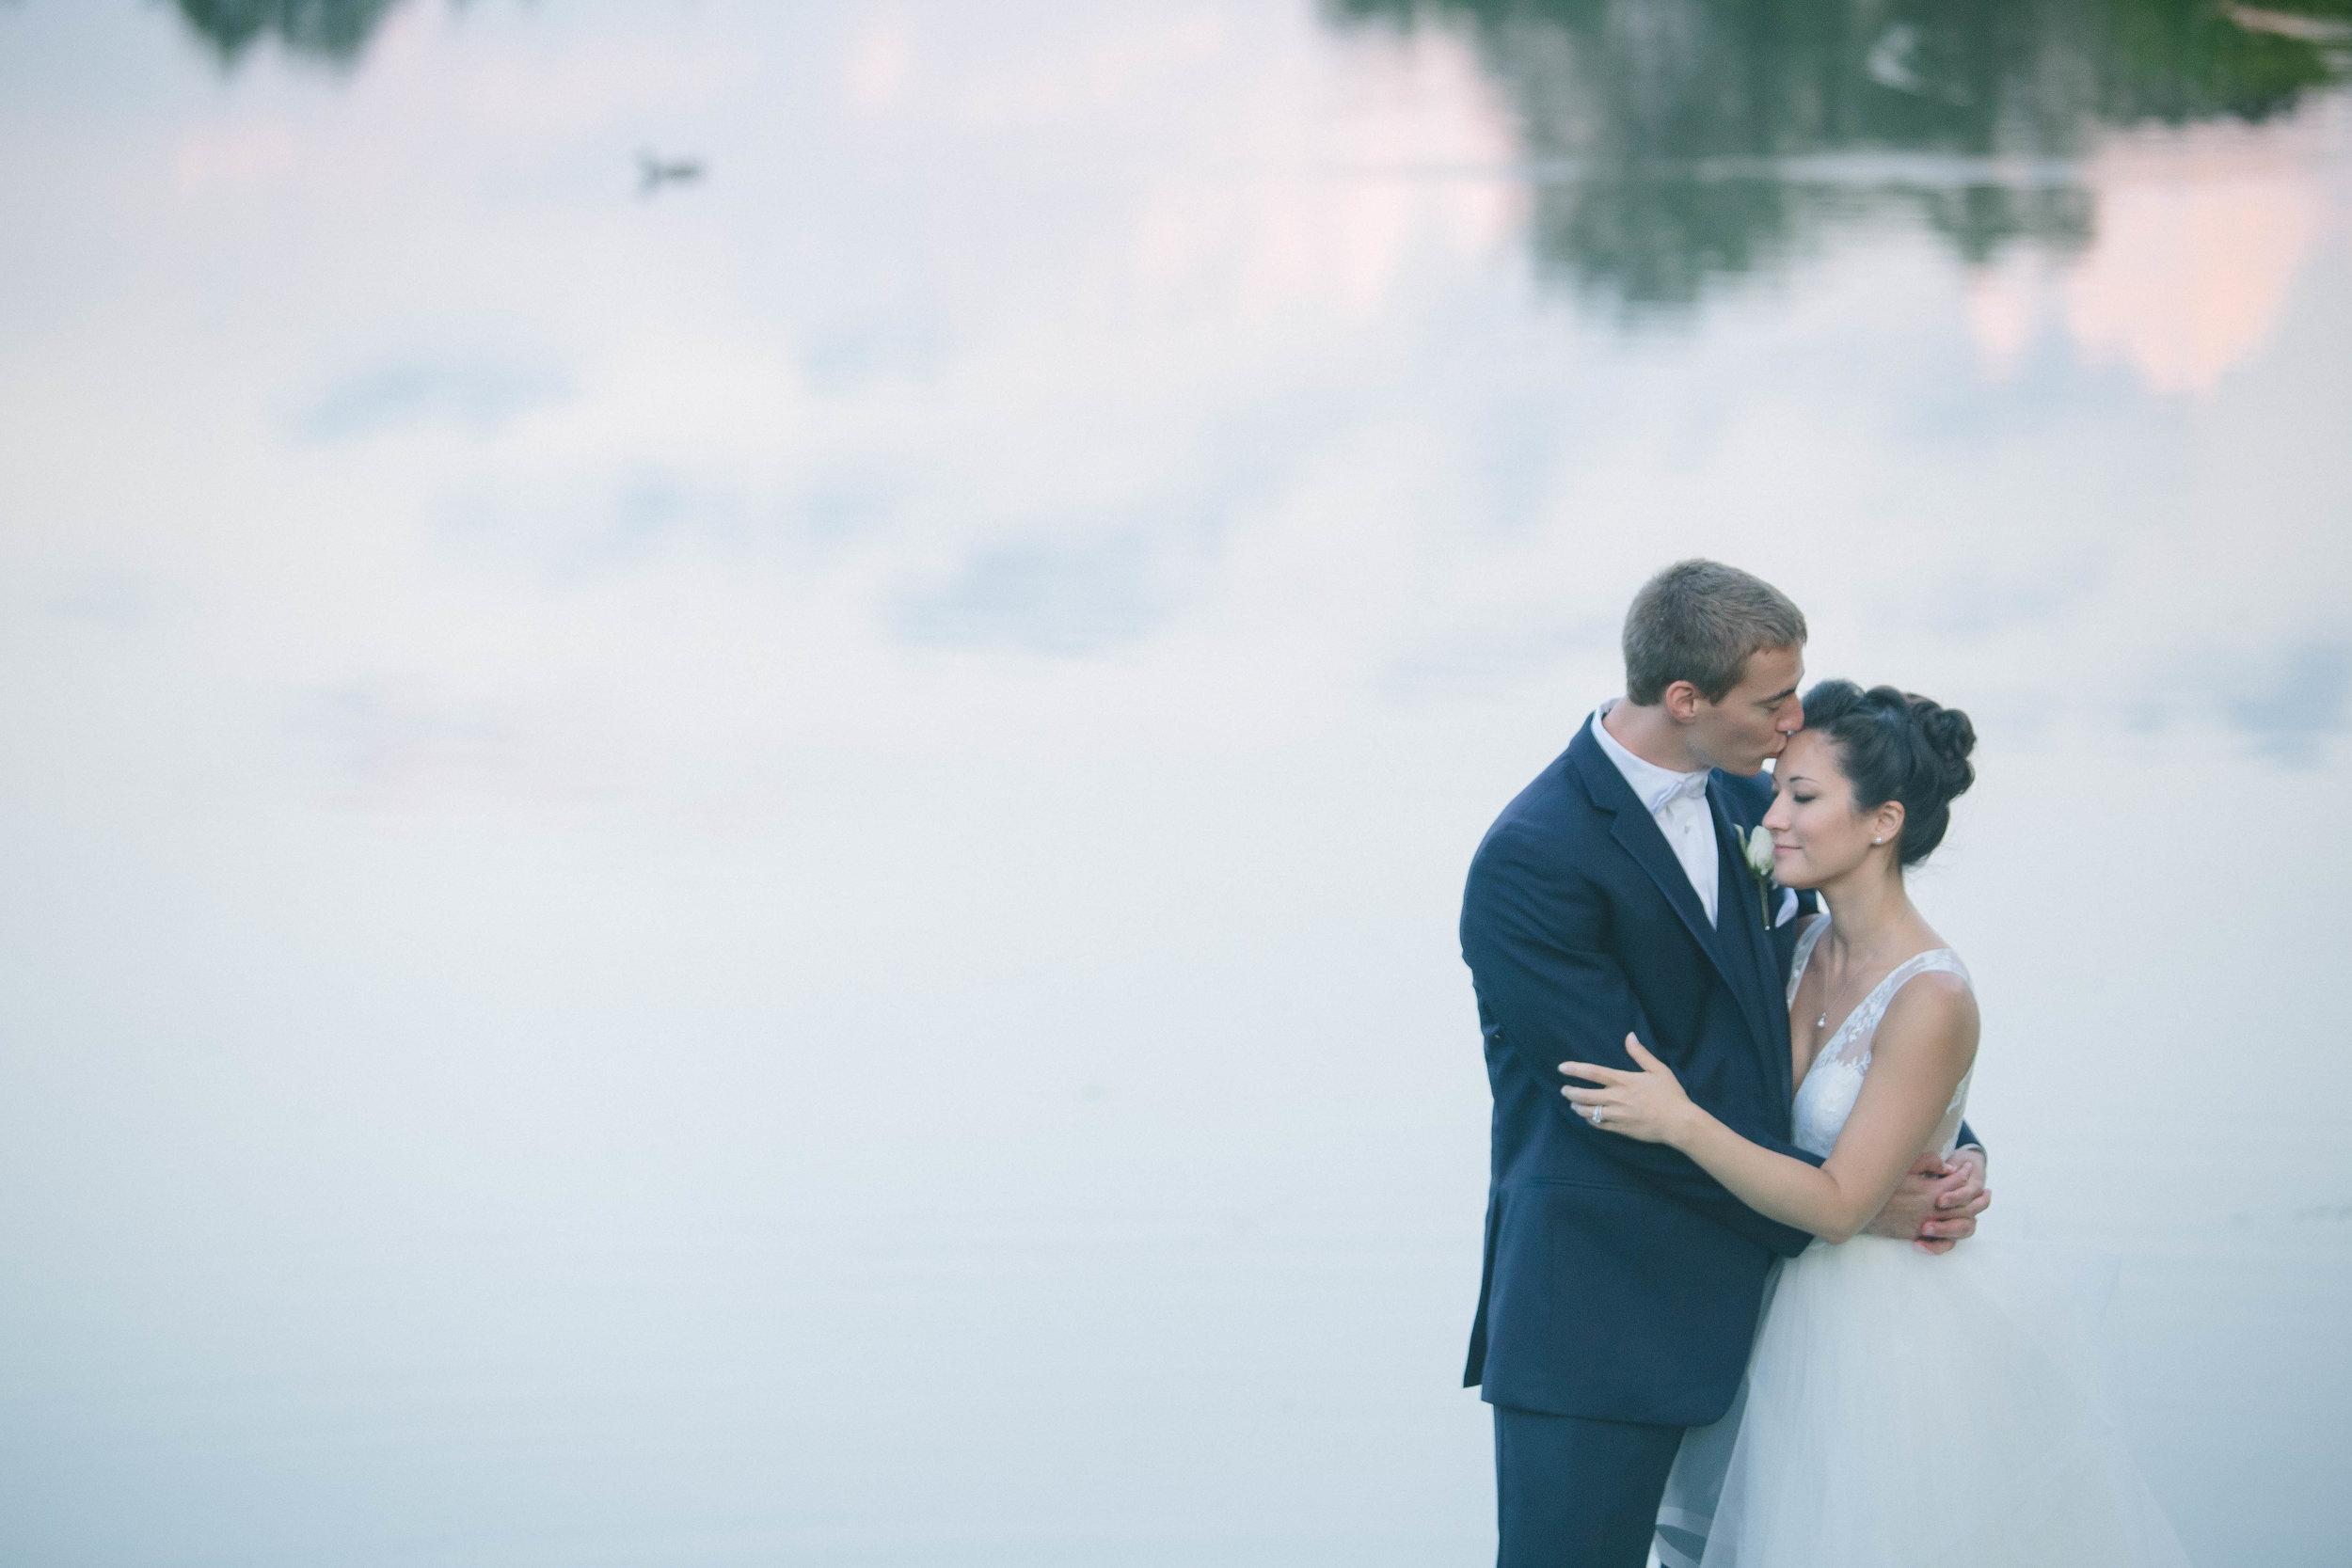 Dan Voss Wedding Photography.jpg